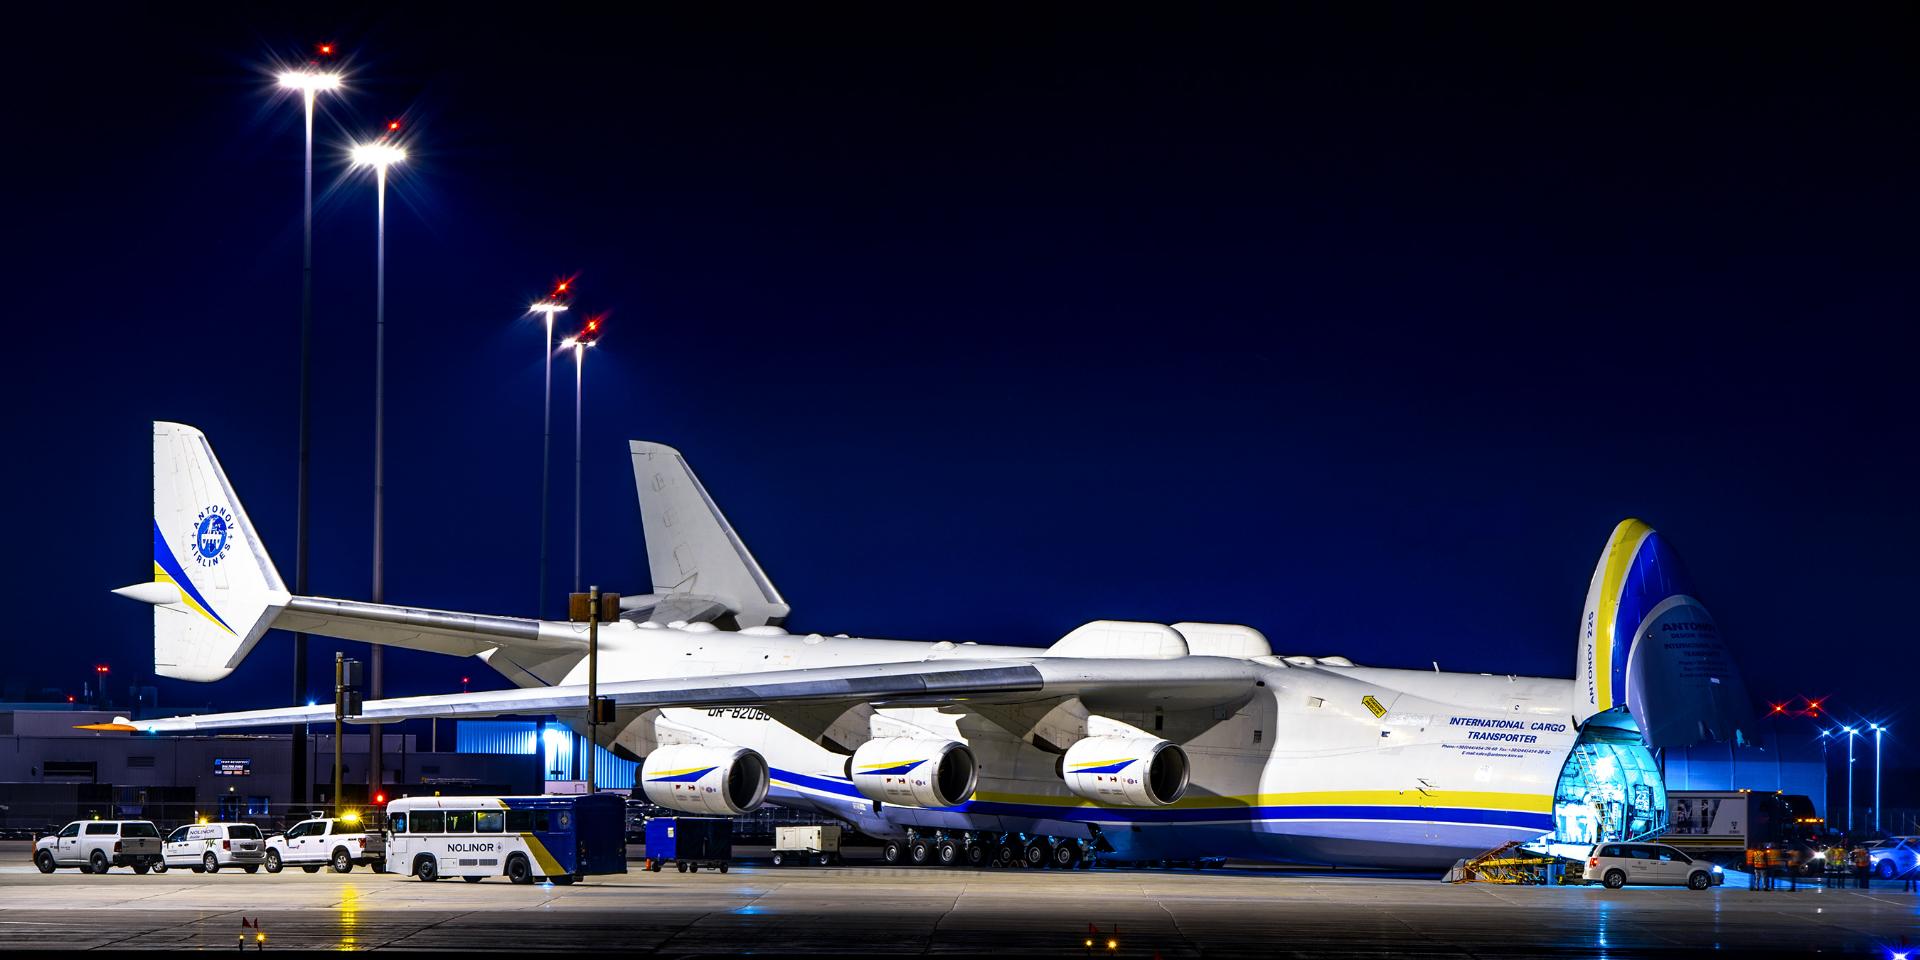 Celian Genier/Nolinor Aviation Photo